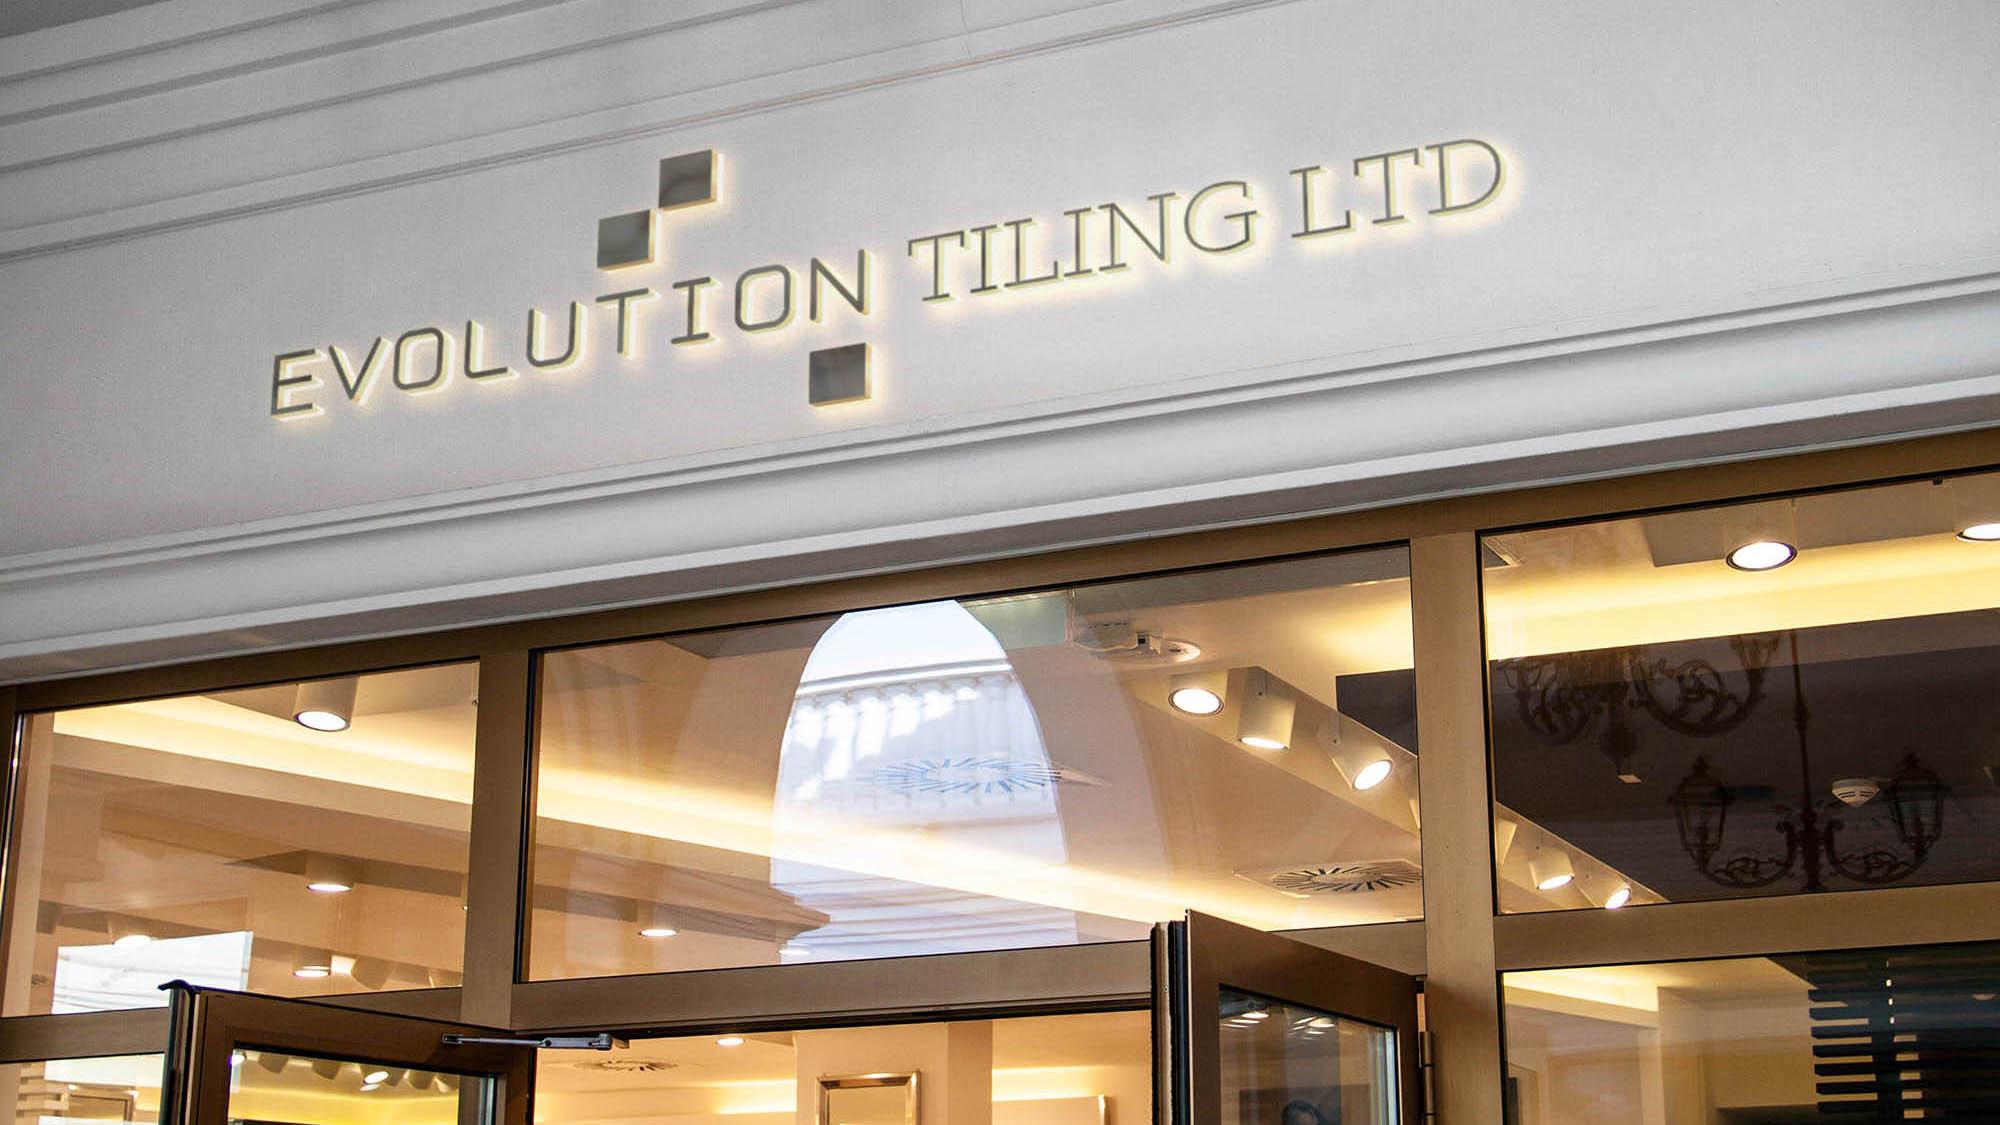 Evolution Tiling Retail Store